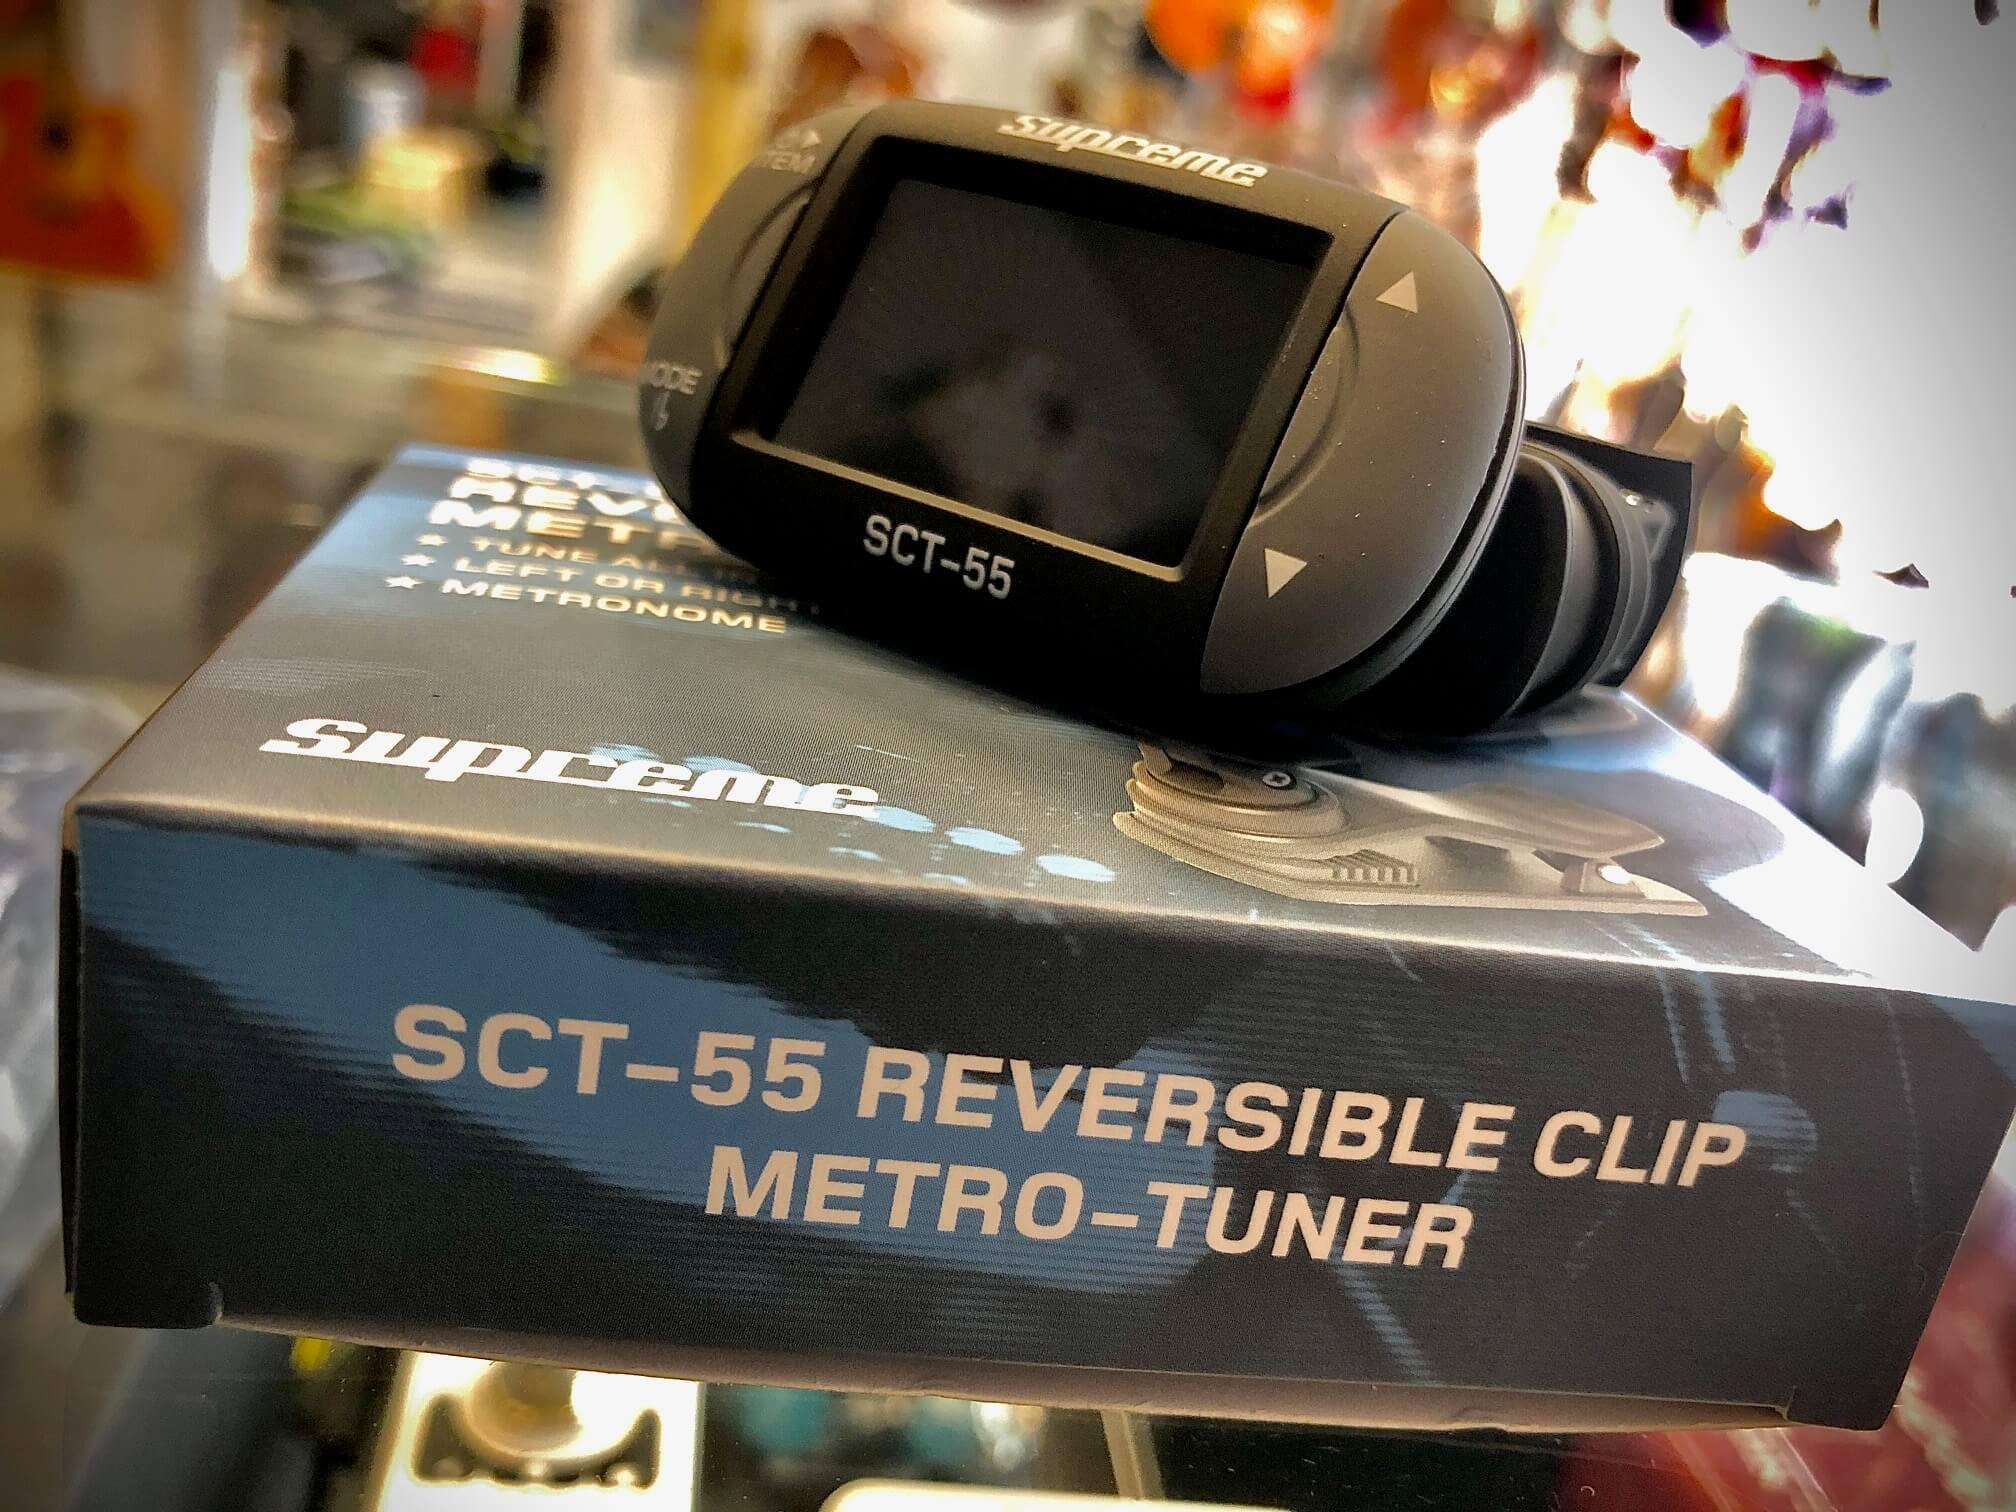 Supreme SCT-55 Reversible Clip Metro Tuner